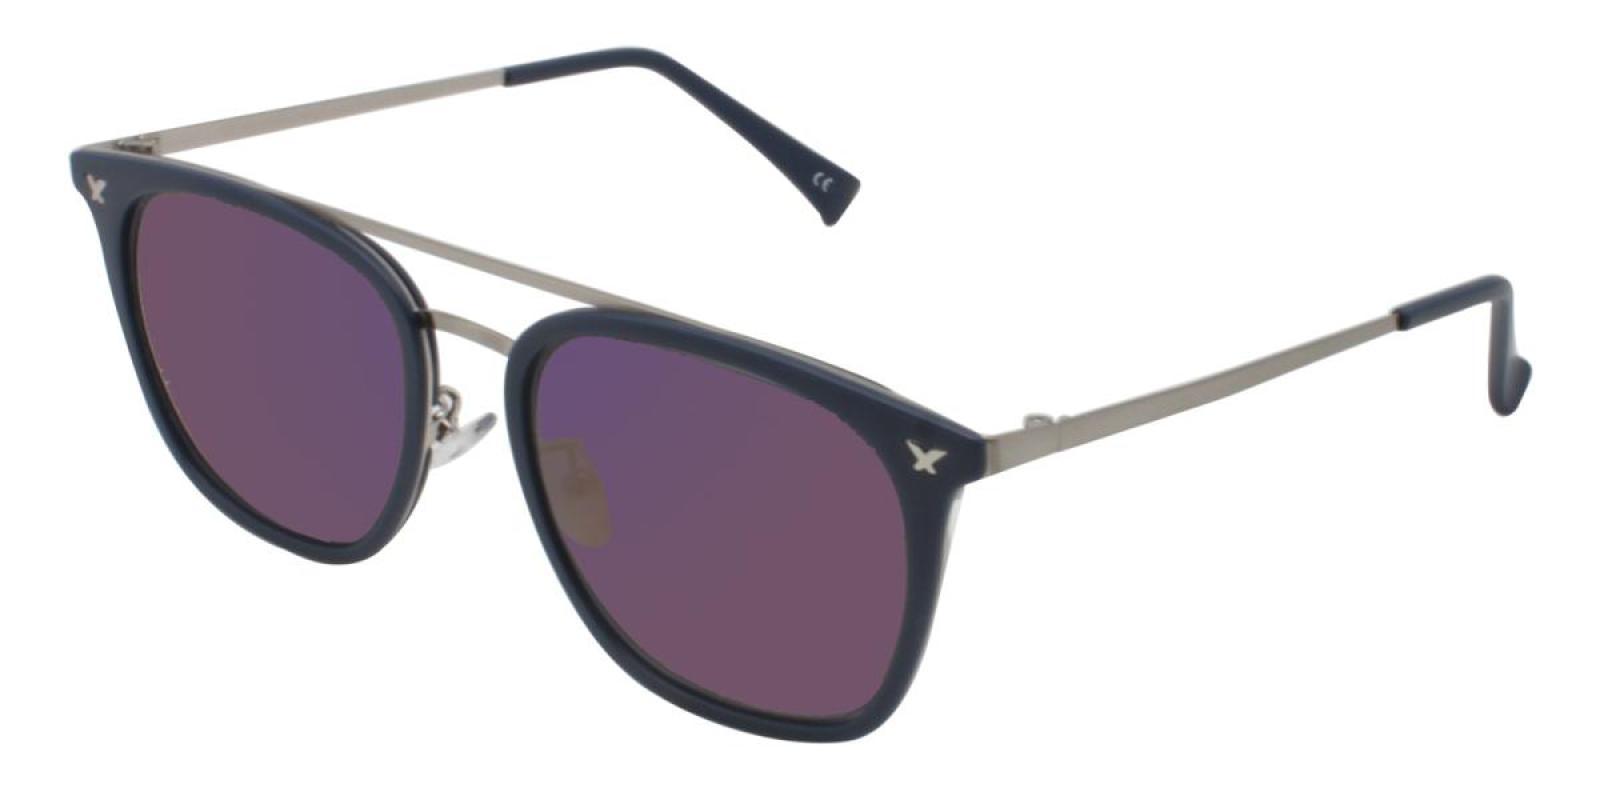 Seagual-Blue-Aviator-Metal / Combination / TR-Sunglasses-additional1